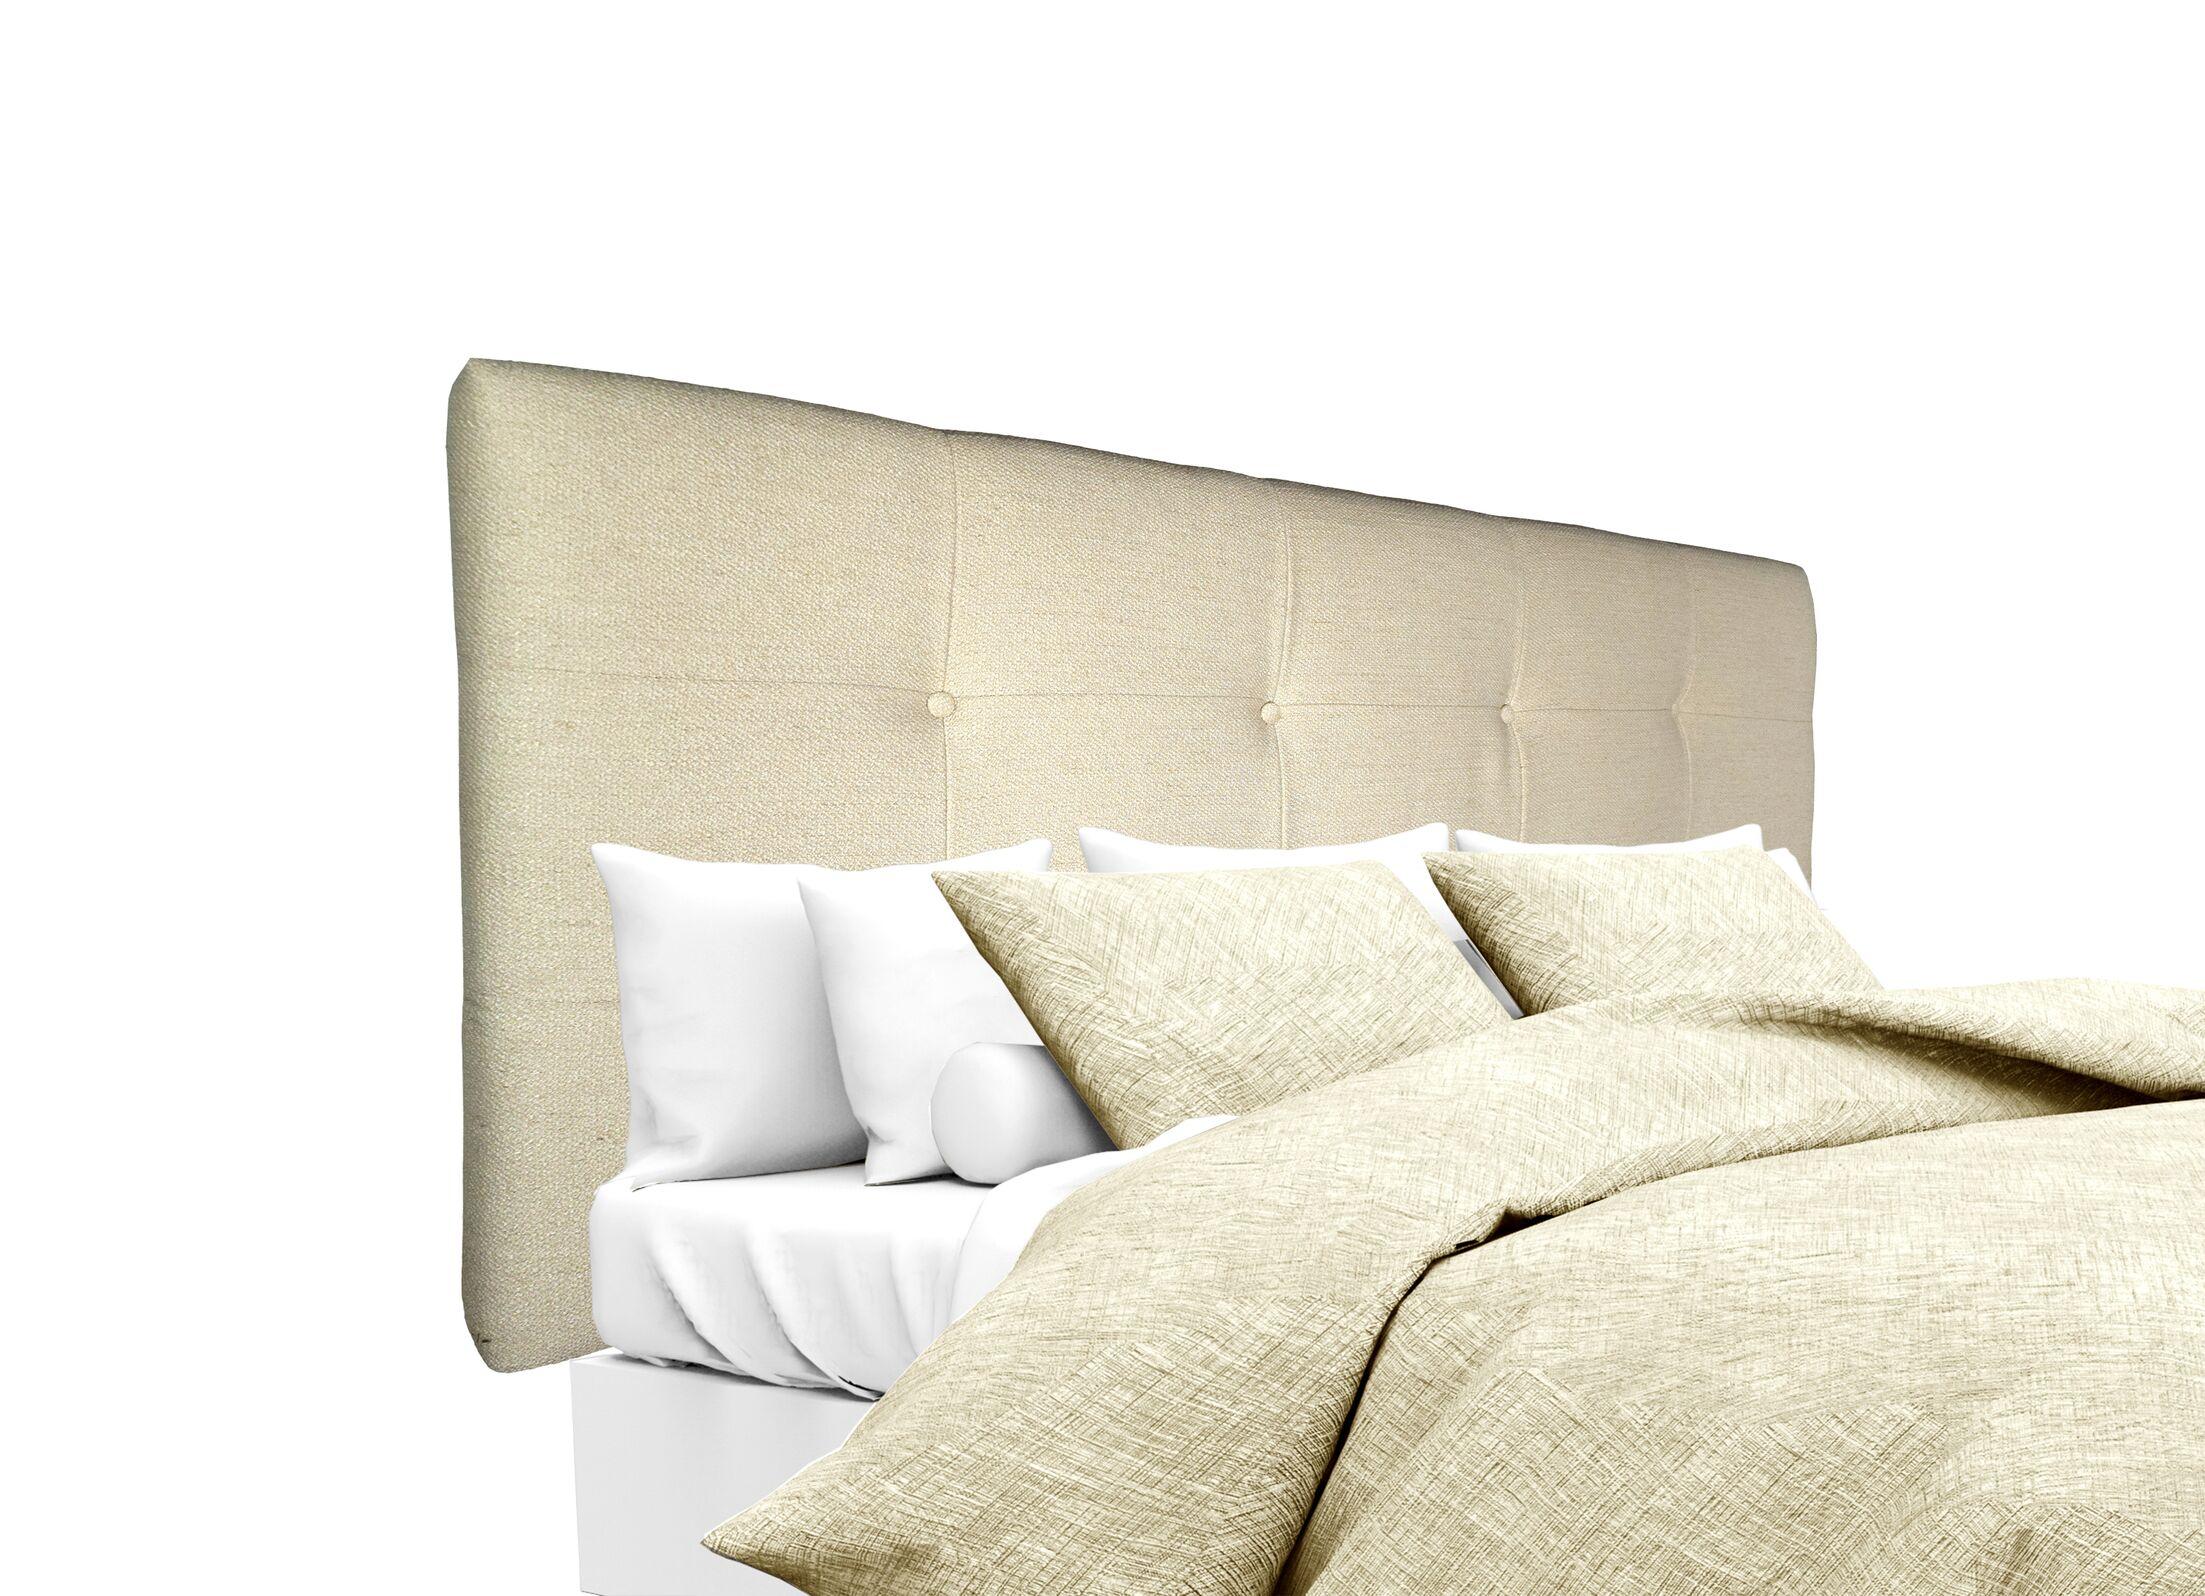 Belfast Upholstered Panel Headboard Size: Queen, Upholstery: Linen